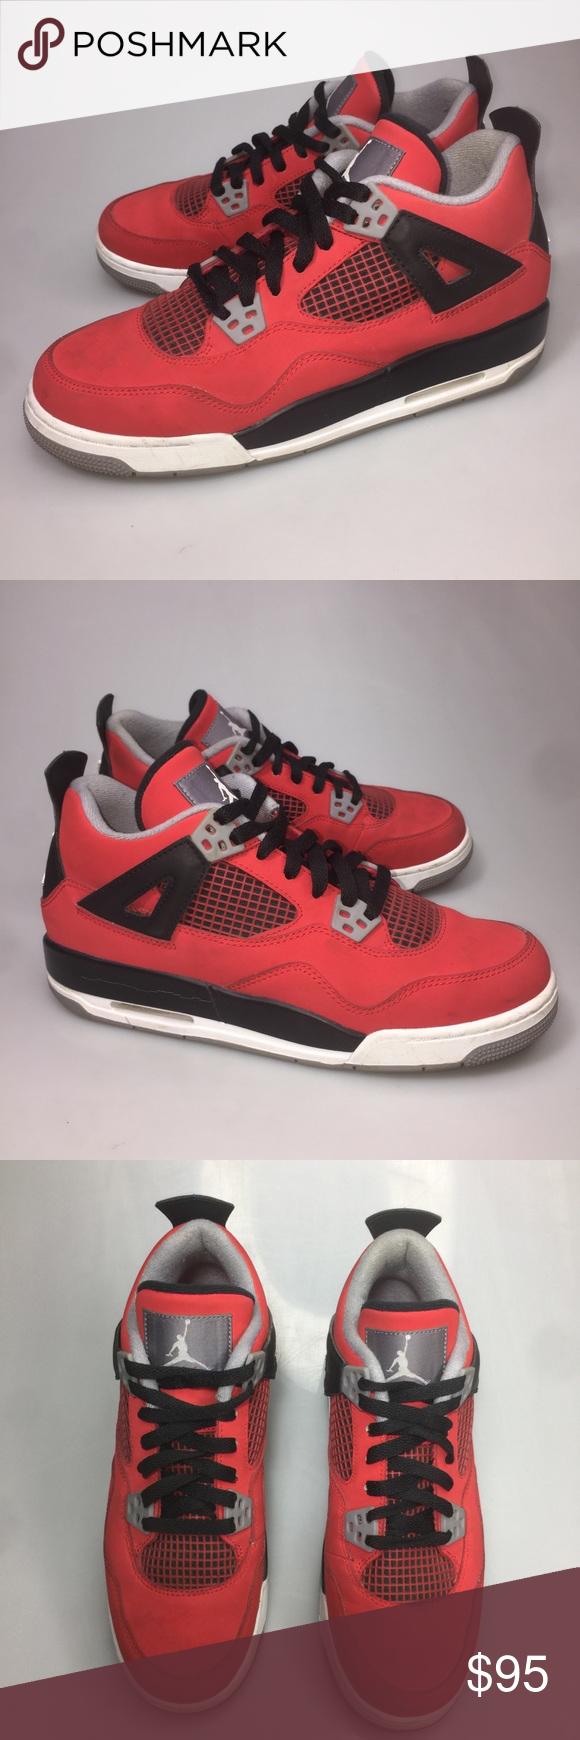 a11b770d25ce3d Nike Air Jordan Retro 4 Toro Bravo 7Y Women 8.5 Nike Air Jordan Retro 4 Toro